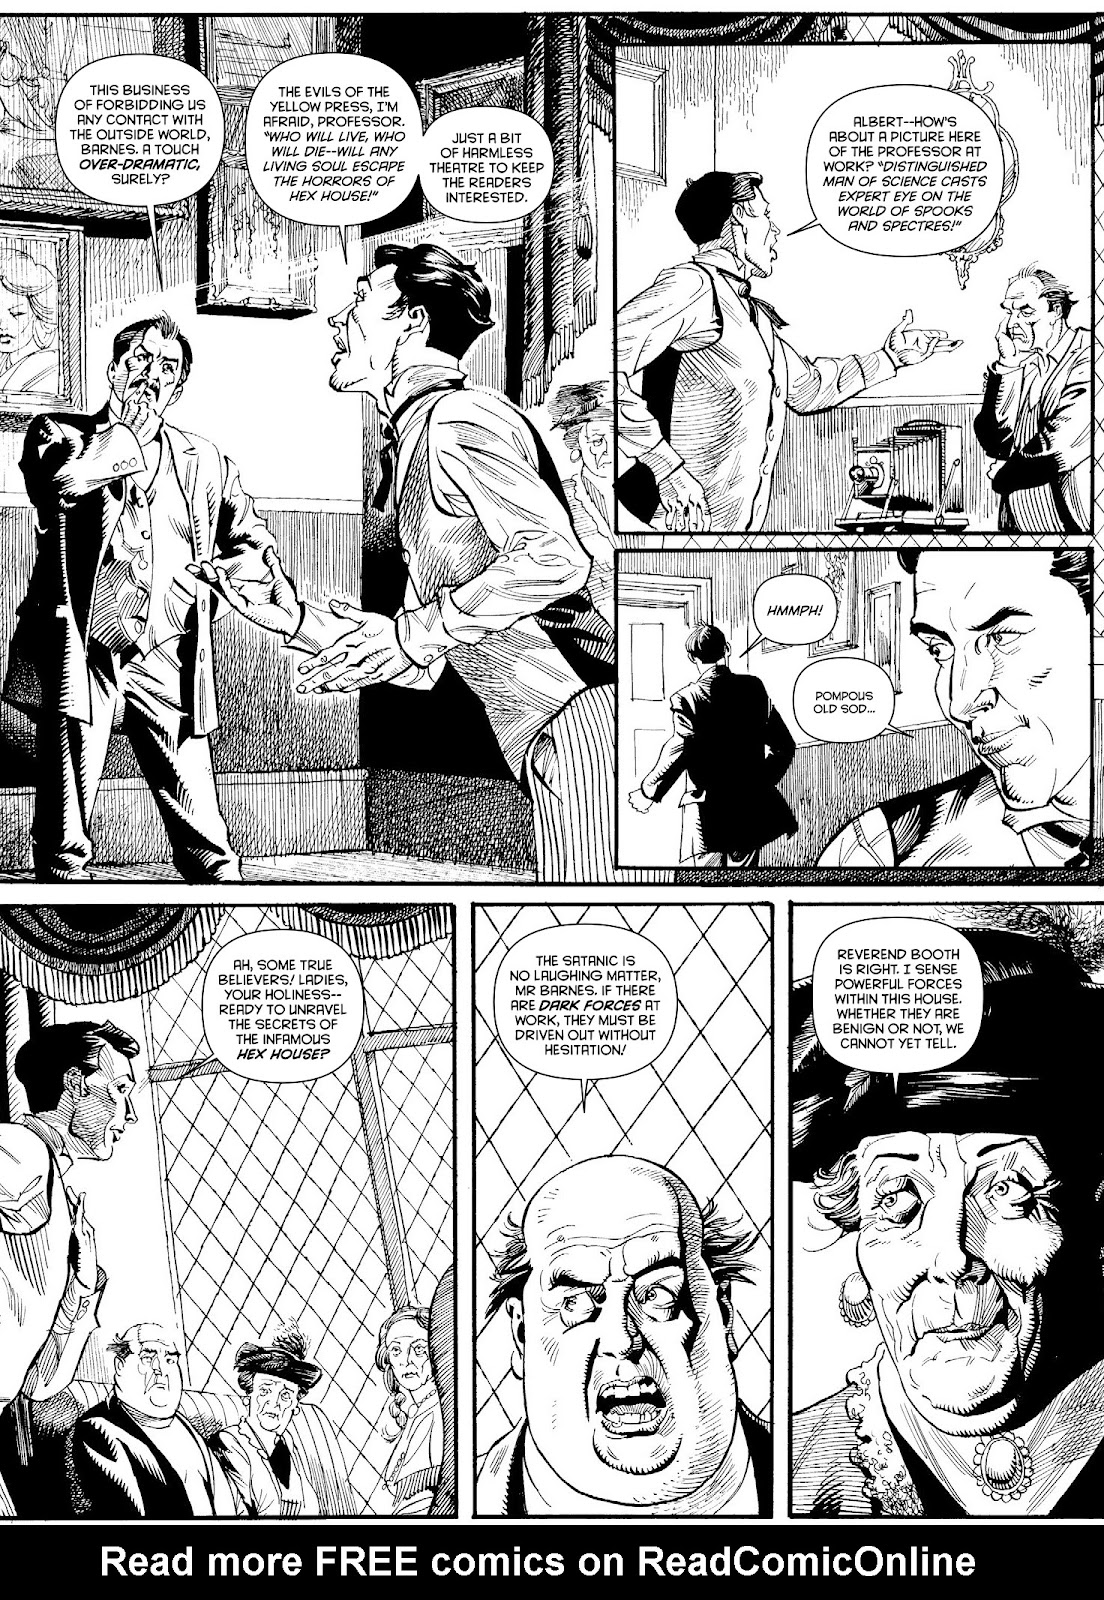 Judge Dredd Megazine (Vol. 5) issue 427 - Page 79